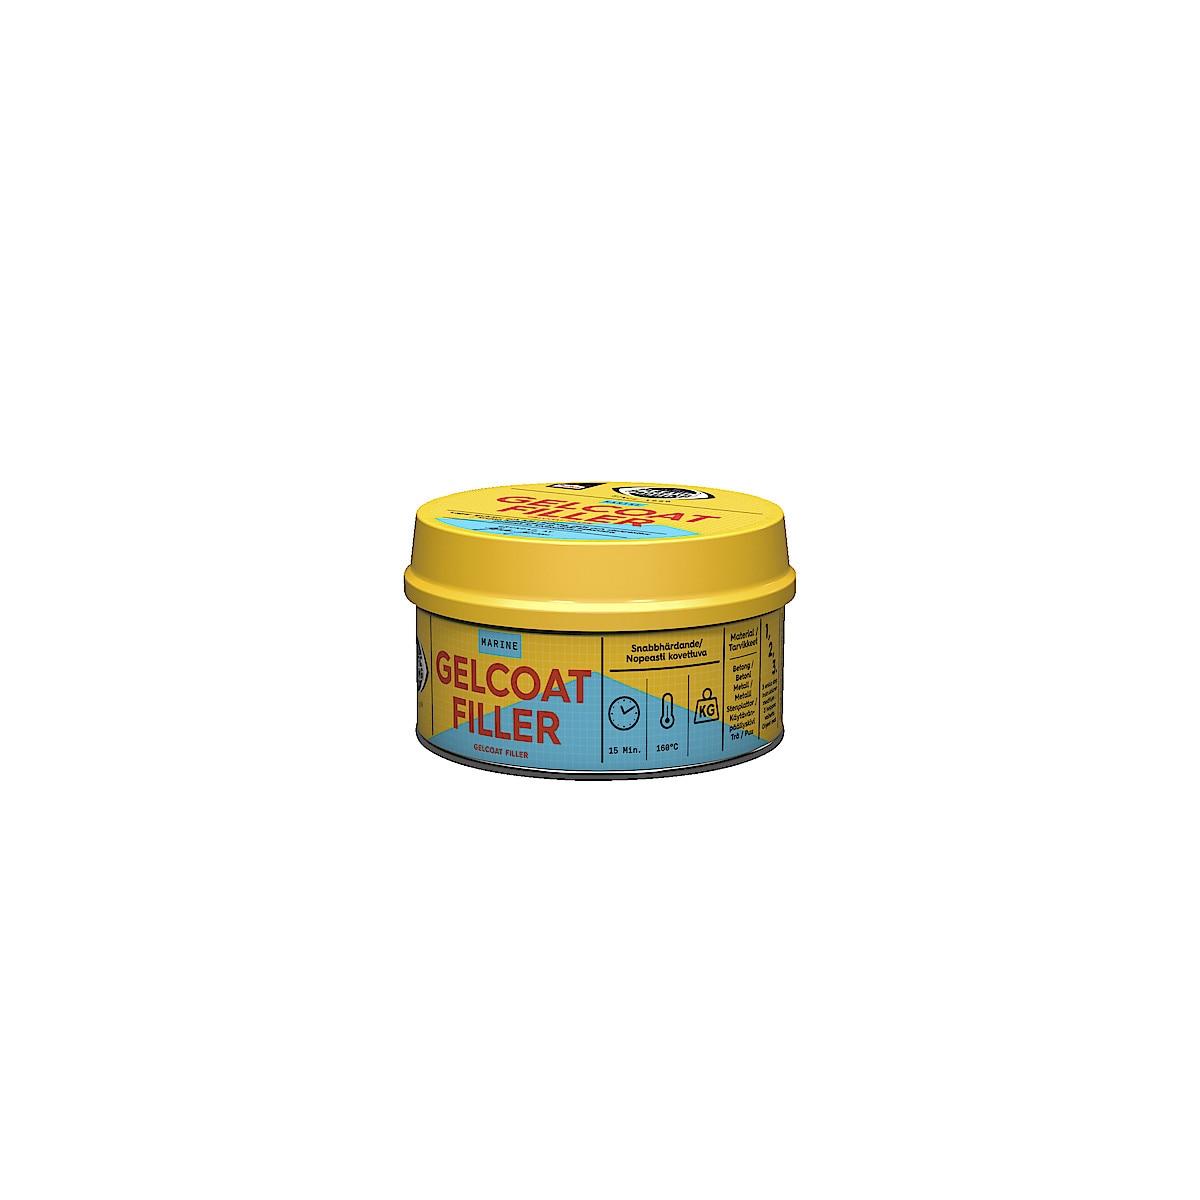 Gelcoat Filler Plastic Padding